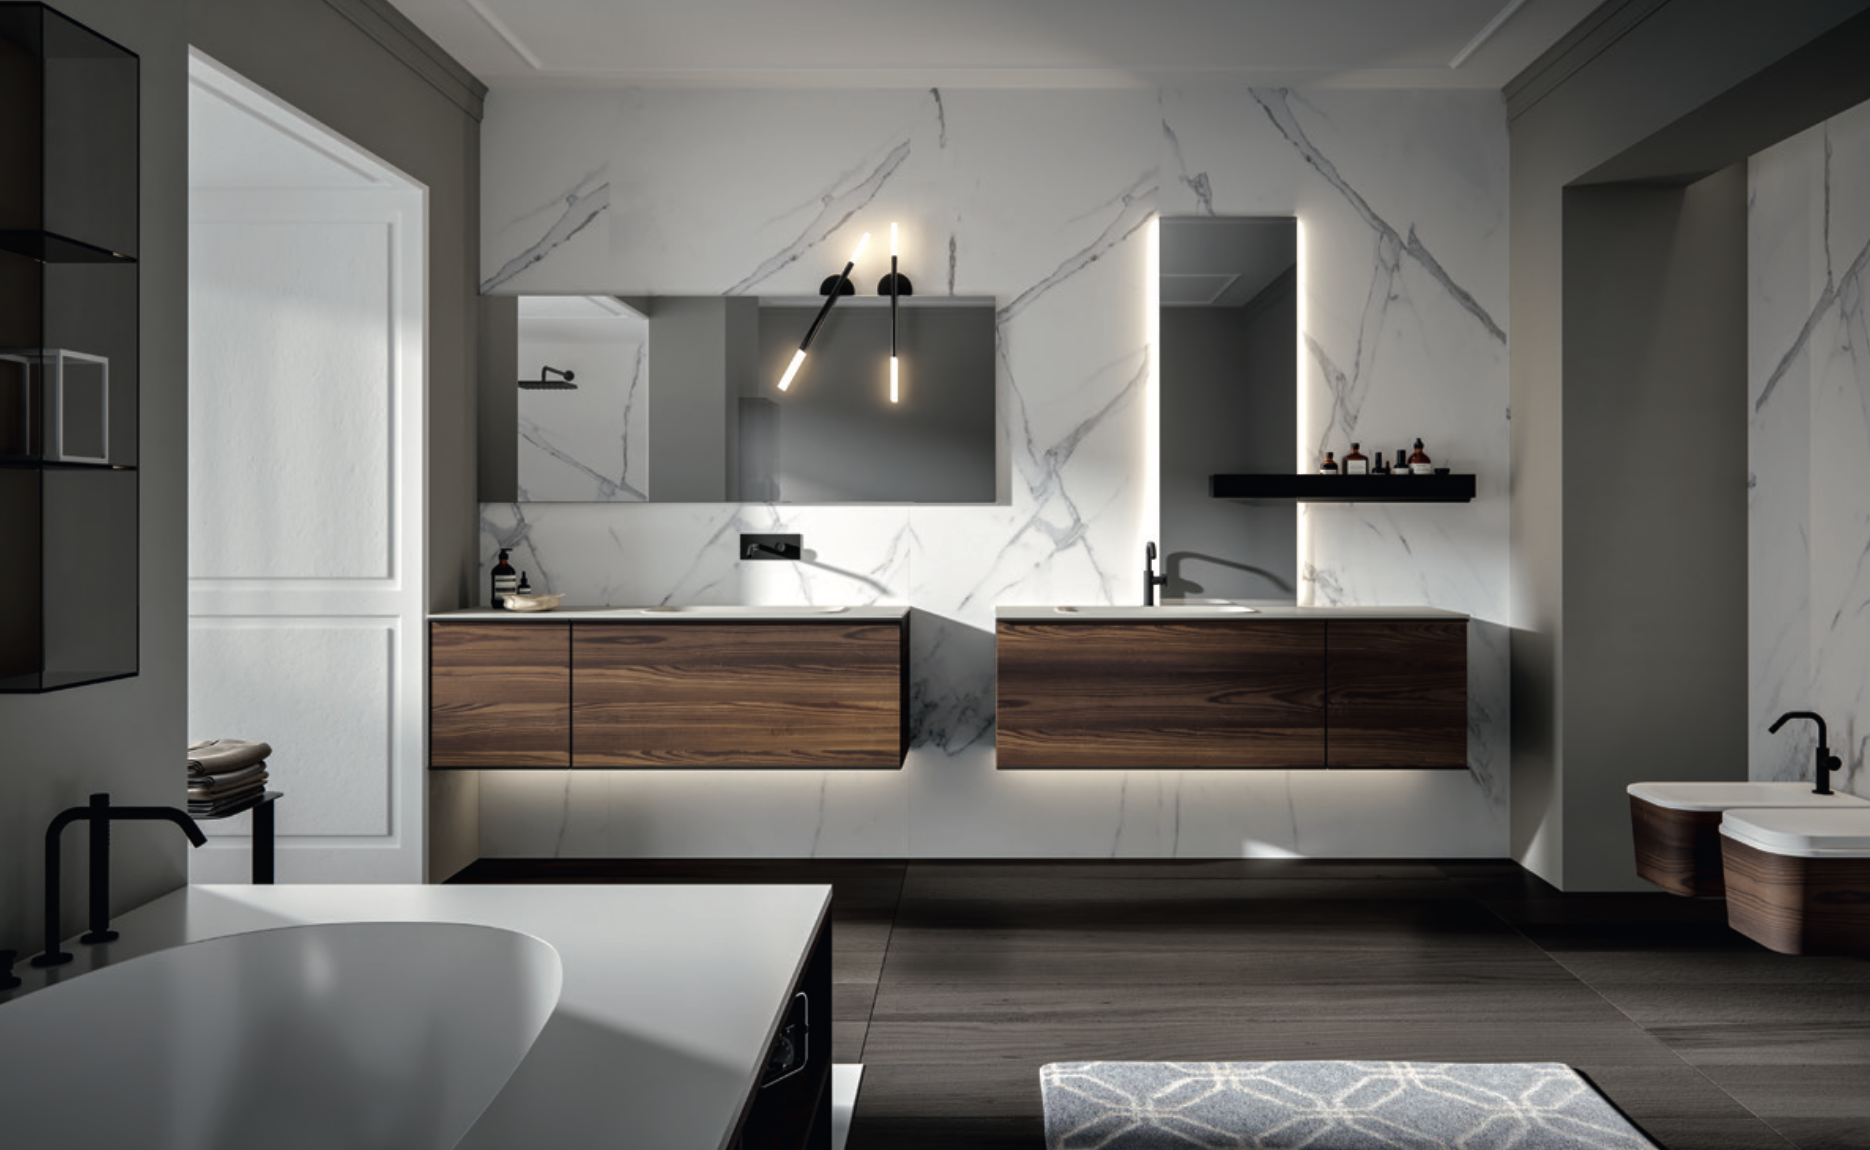 Veneta Cucine Doral - kitchen,cabinets,italian kitchen ...